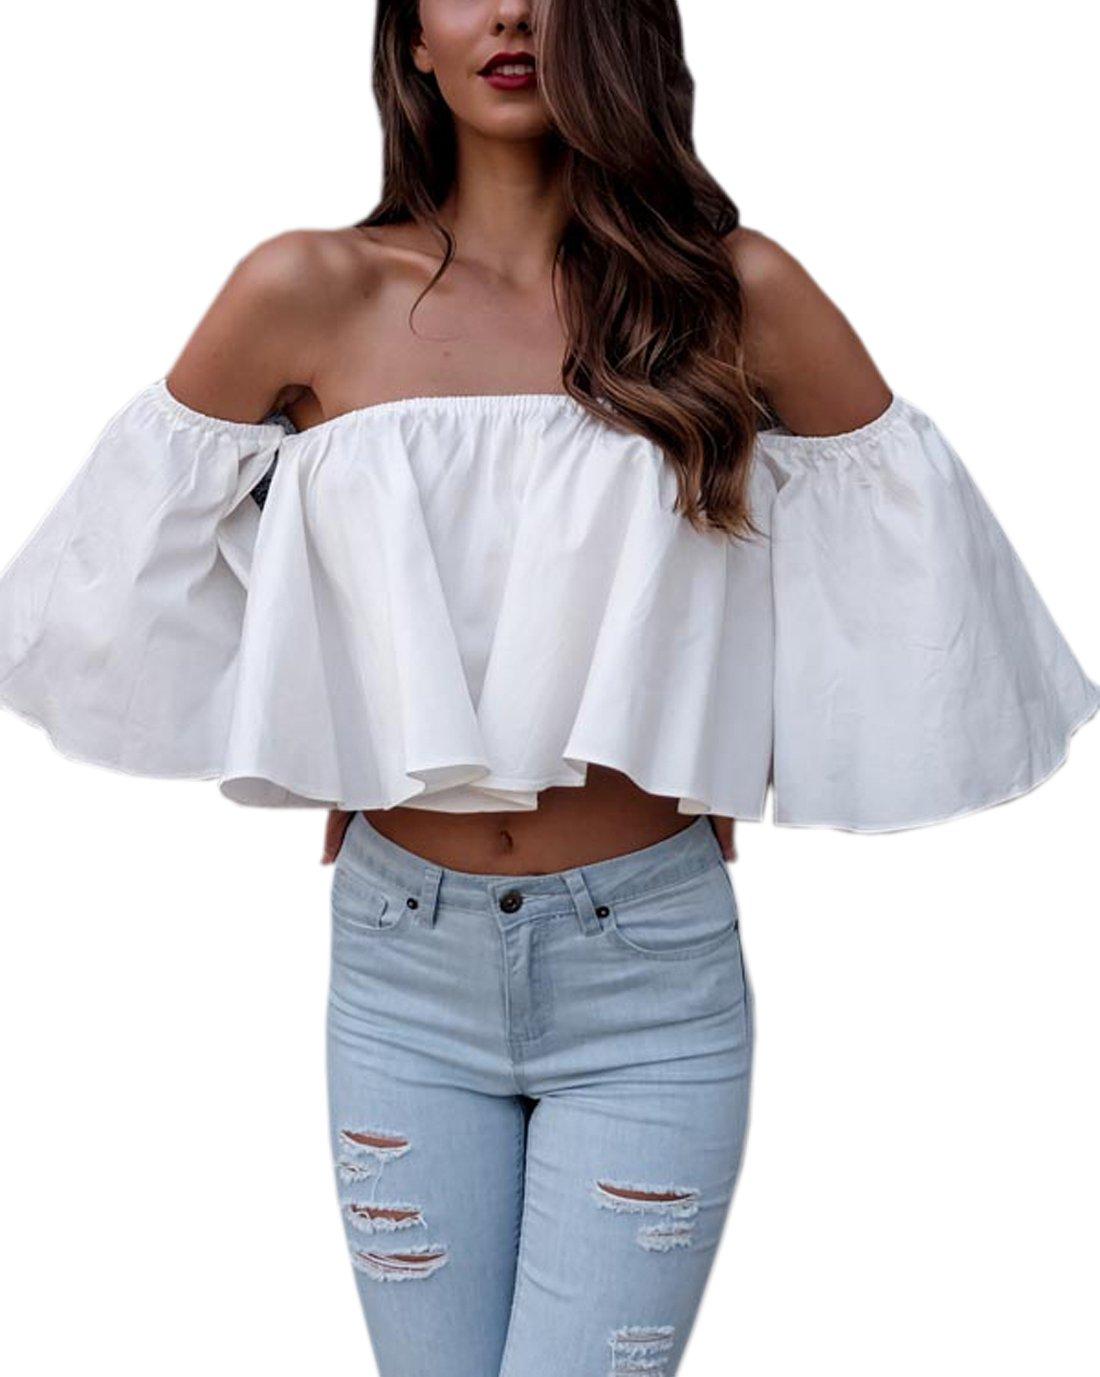 0f71e1740274b Galleon - Relipop Women s Off Shoulder Tops Short Sleeve Shirt Strapless  Blouses (Large